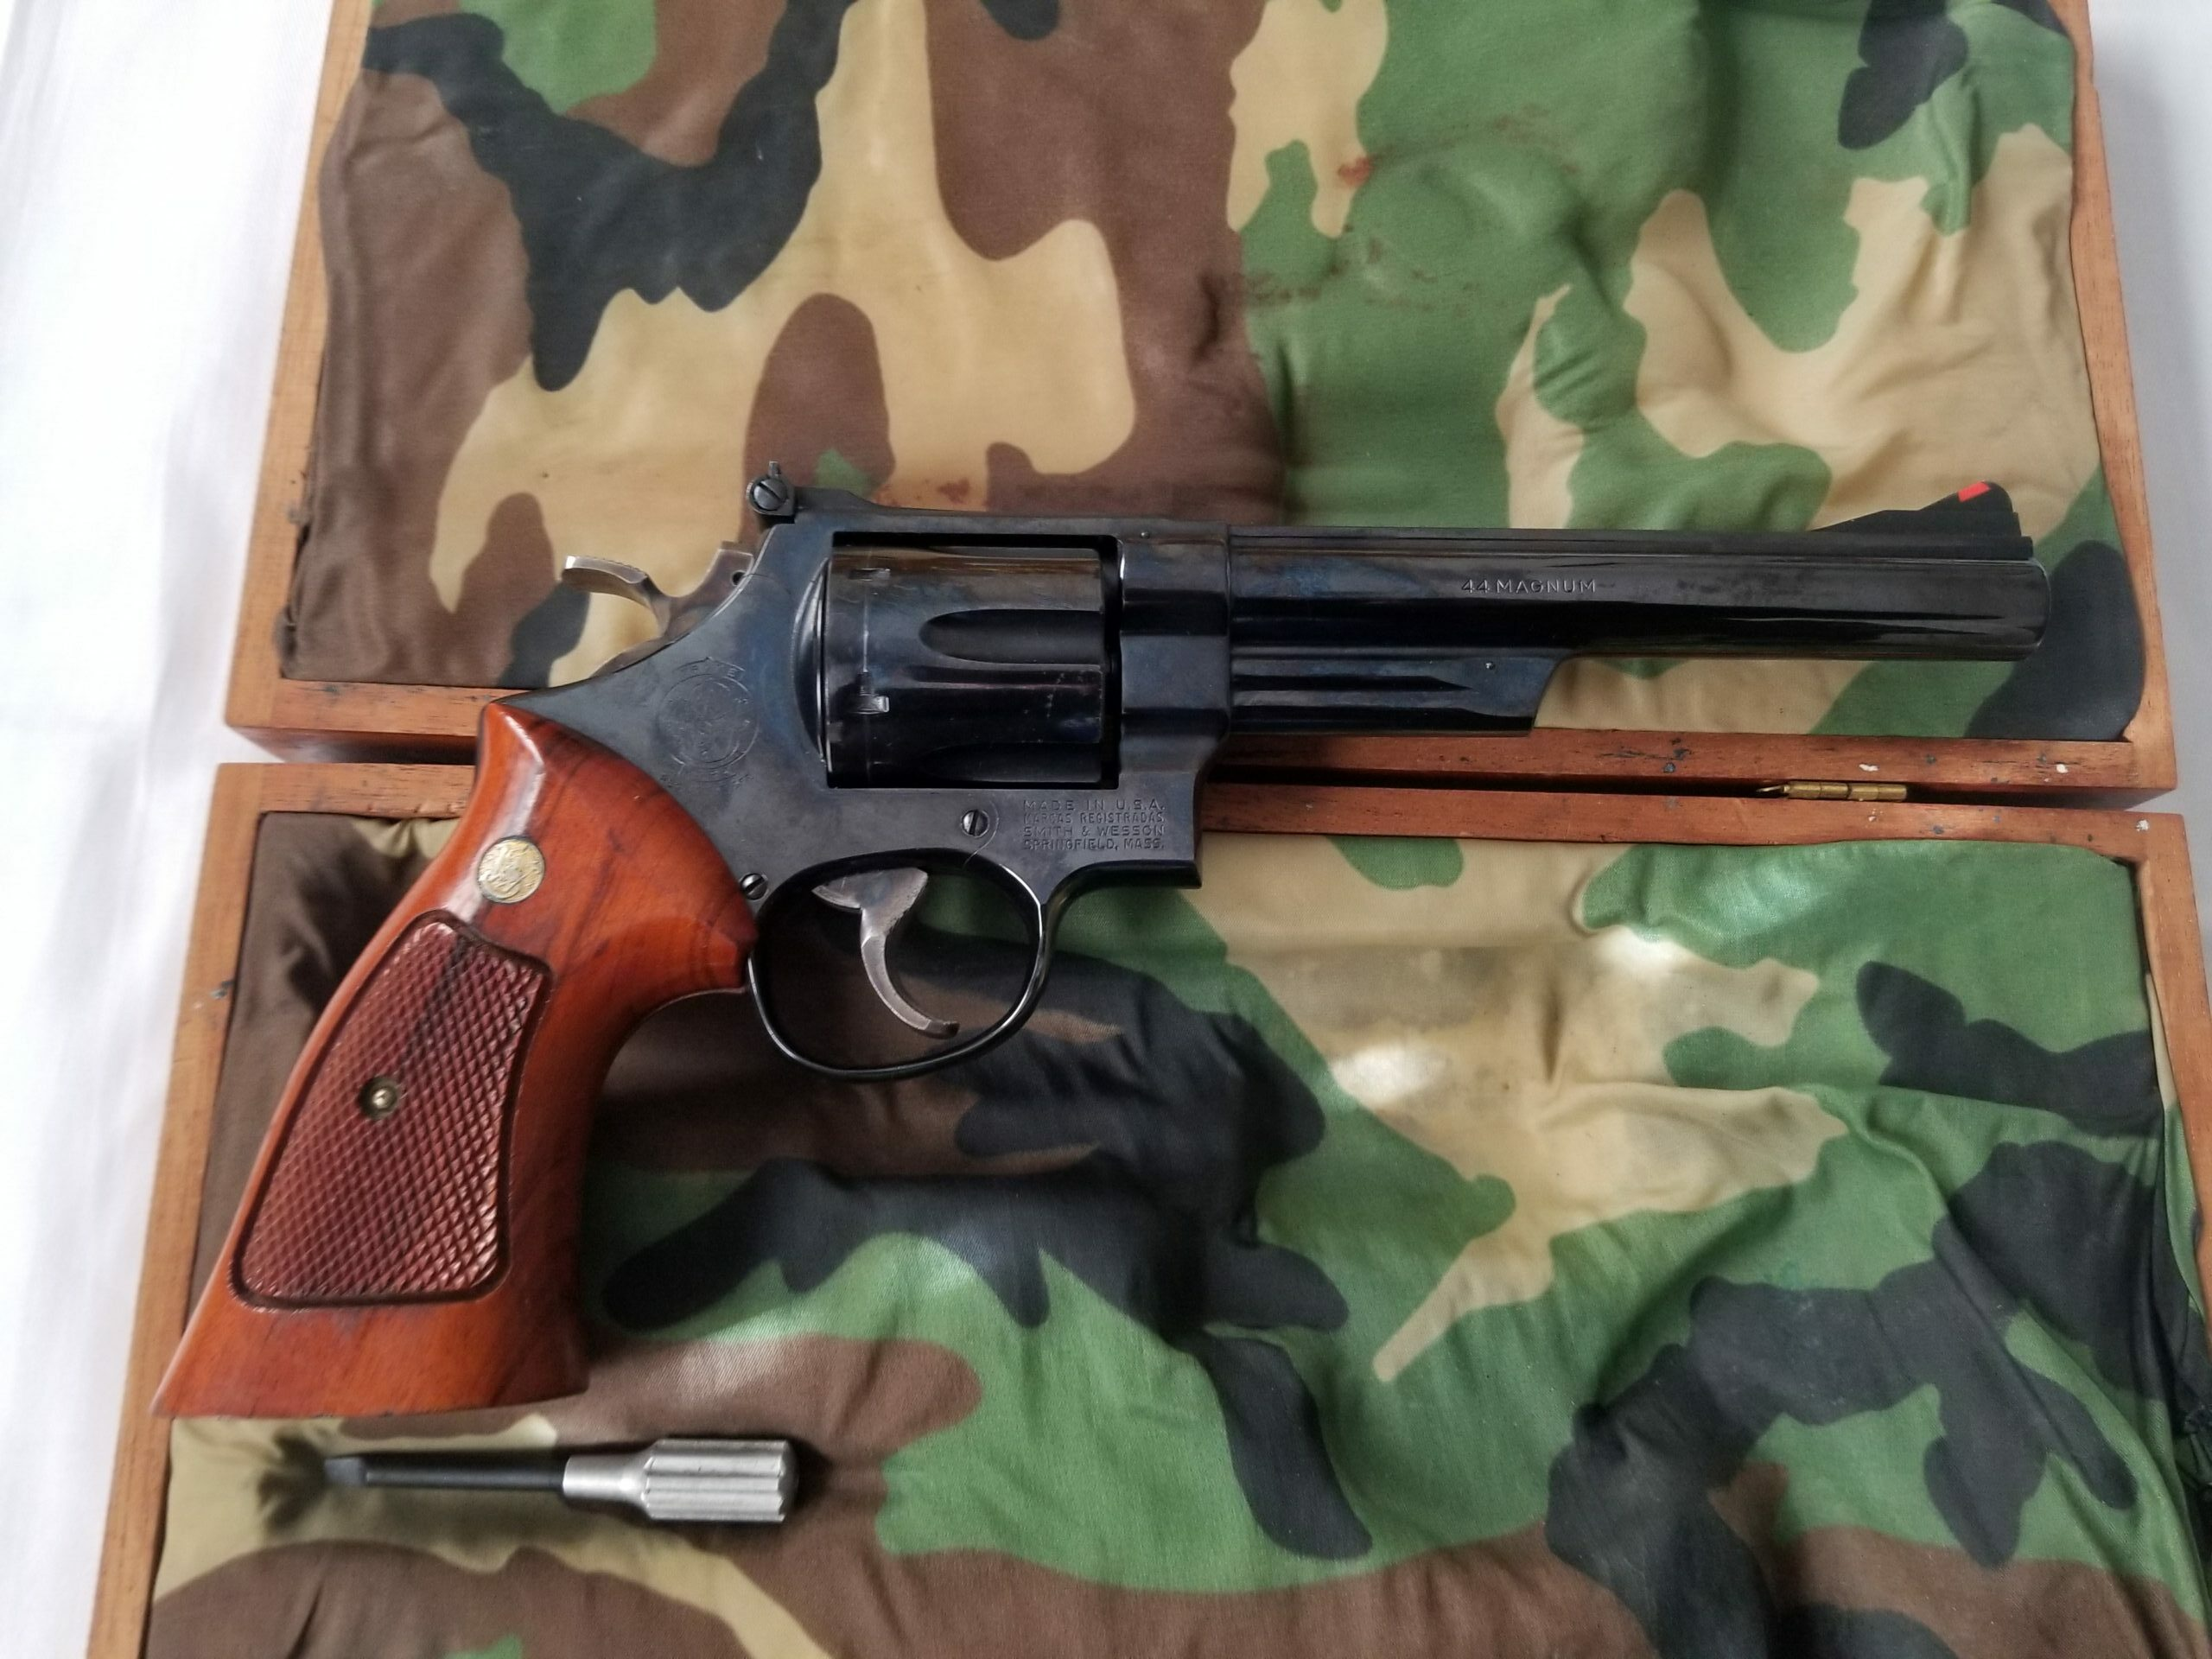 Smith & Wesson Model 29-2 .44 Magnum Revolver